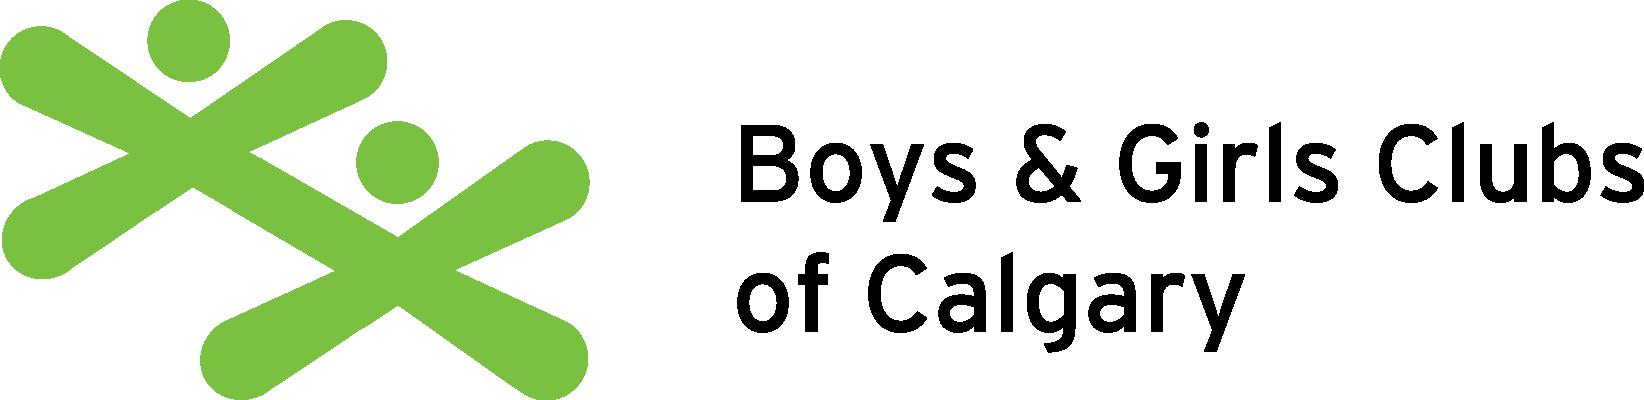 BGCC Horizontal PNG_Black Text.png